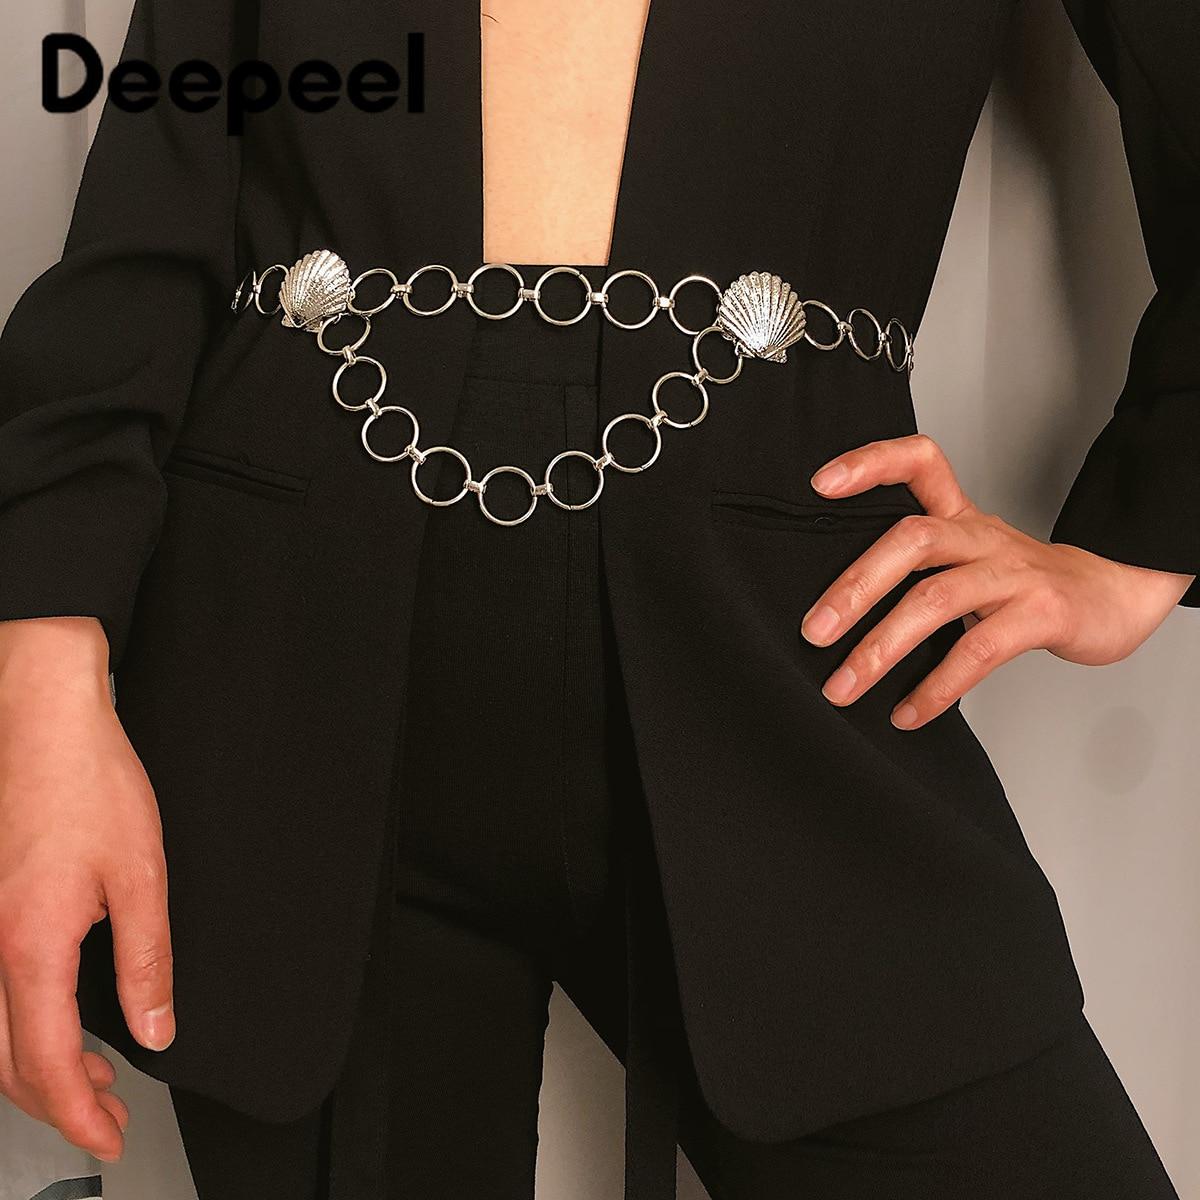 Deepeel 1pc 3.4*102cm Women Metal Round Buckle Cummerbunds Shell Relief Patchwork  Trendy Adjustable Waist Chain For Dress CB650